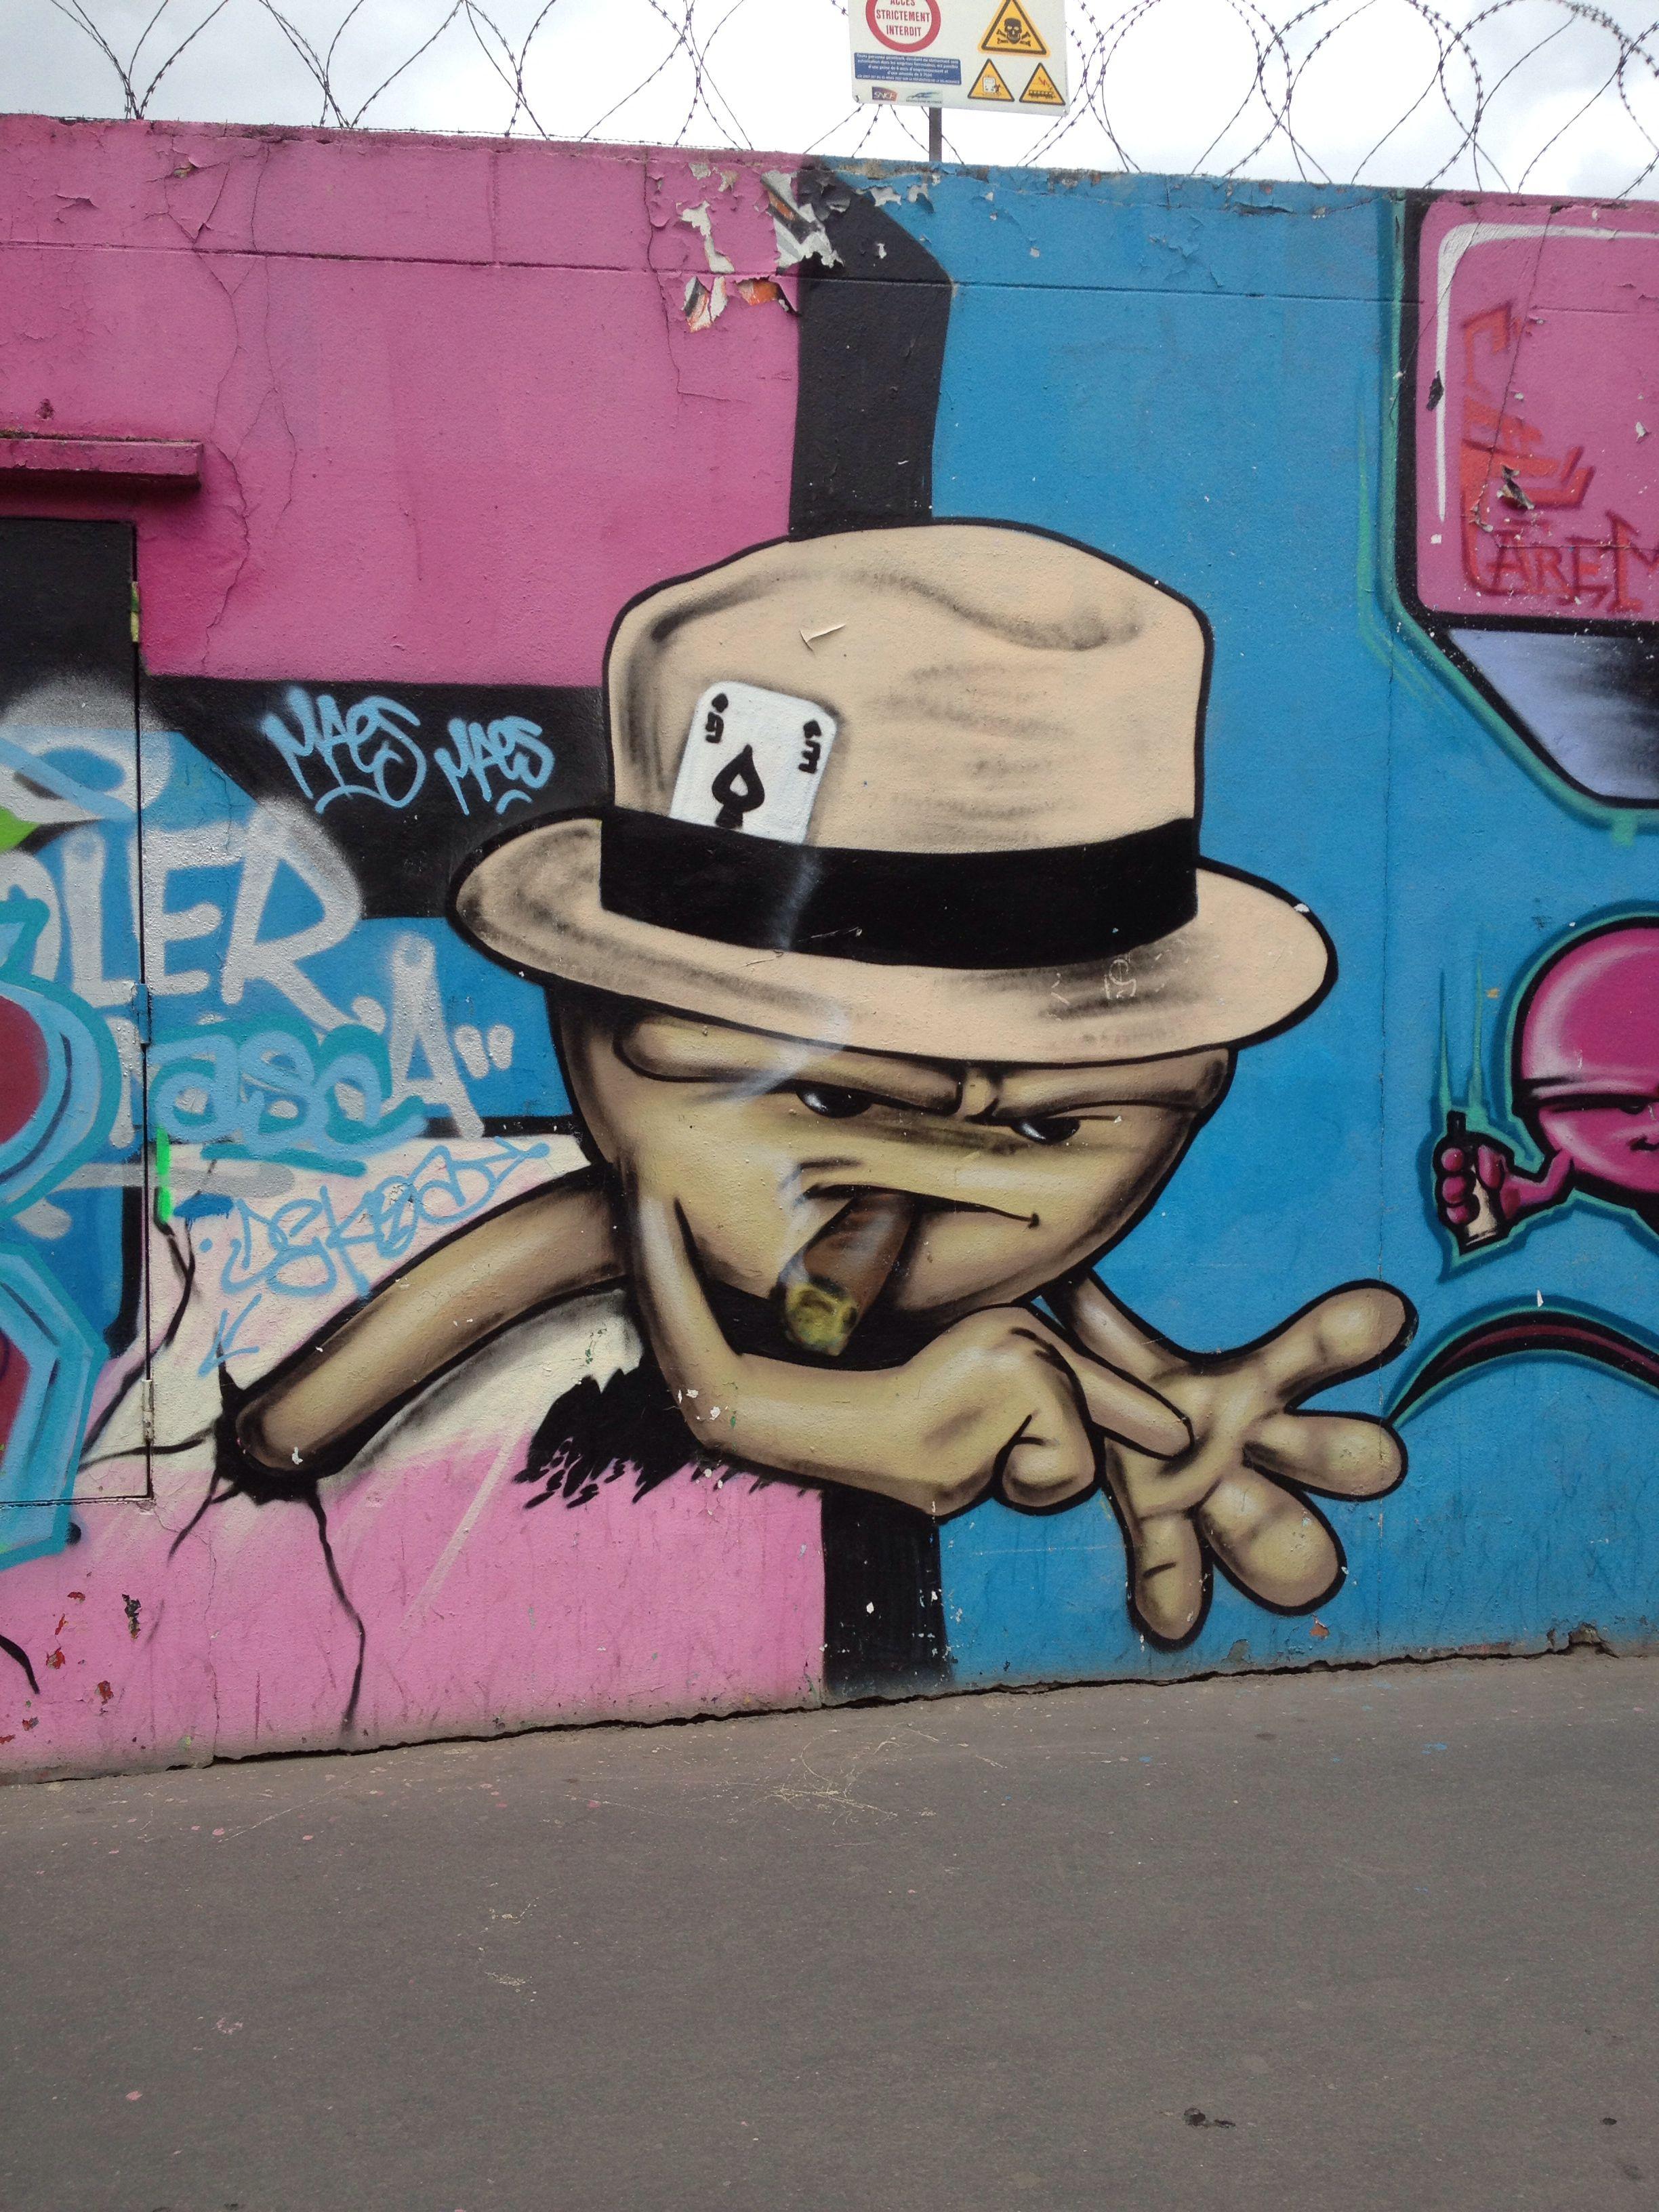 Street art in Paris https://www.etsy.com/shop/urbanNYCdesigns?ref=hdr_shop_menu